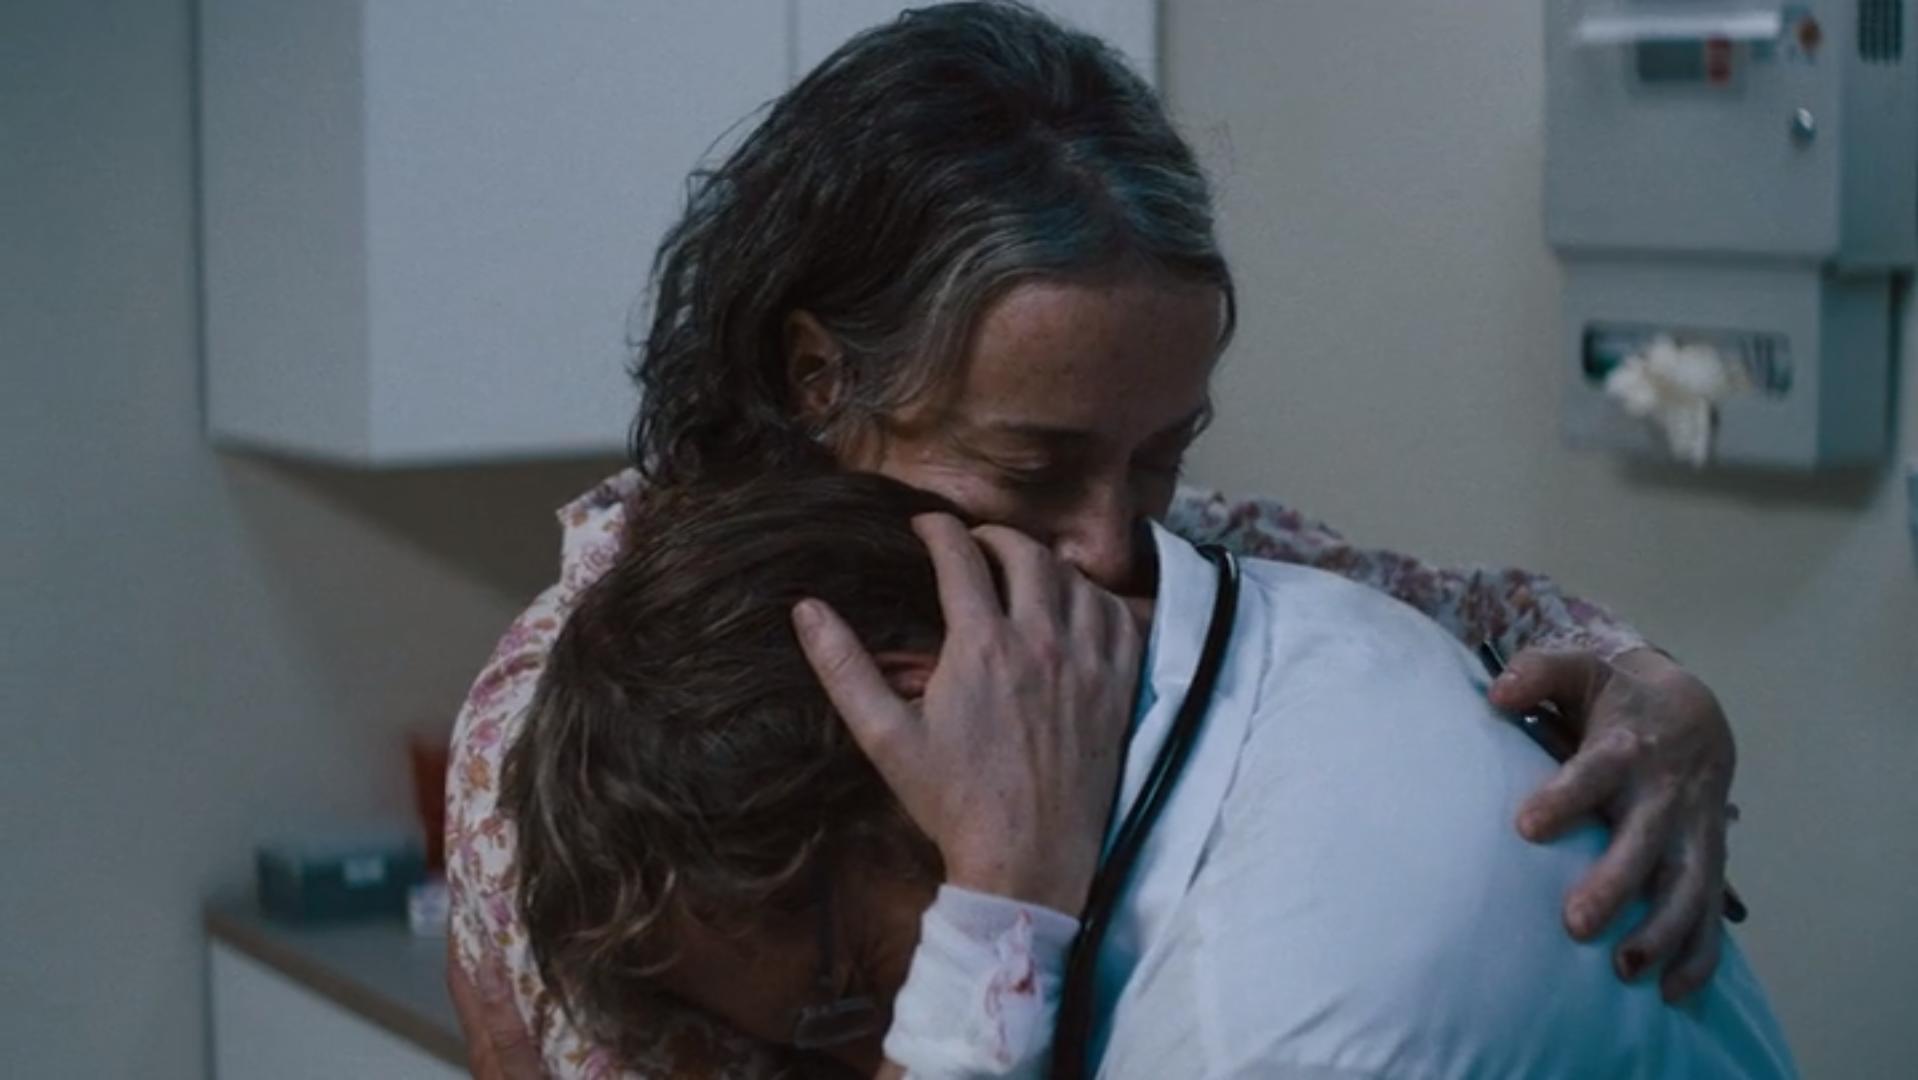 Jane Adams in She Dies Tomorrow hugging on Christian Movie Podcast Cinematic Doctrine CINDOC